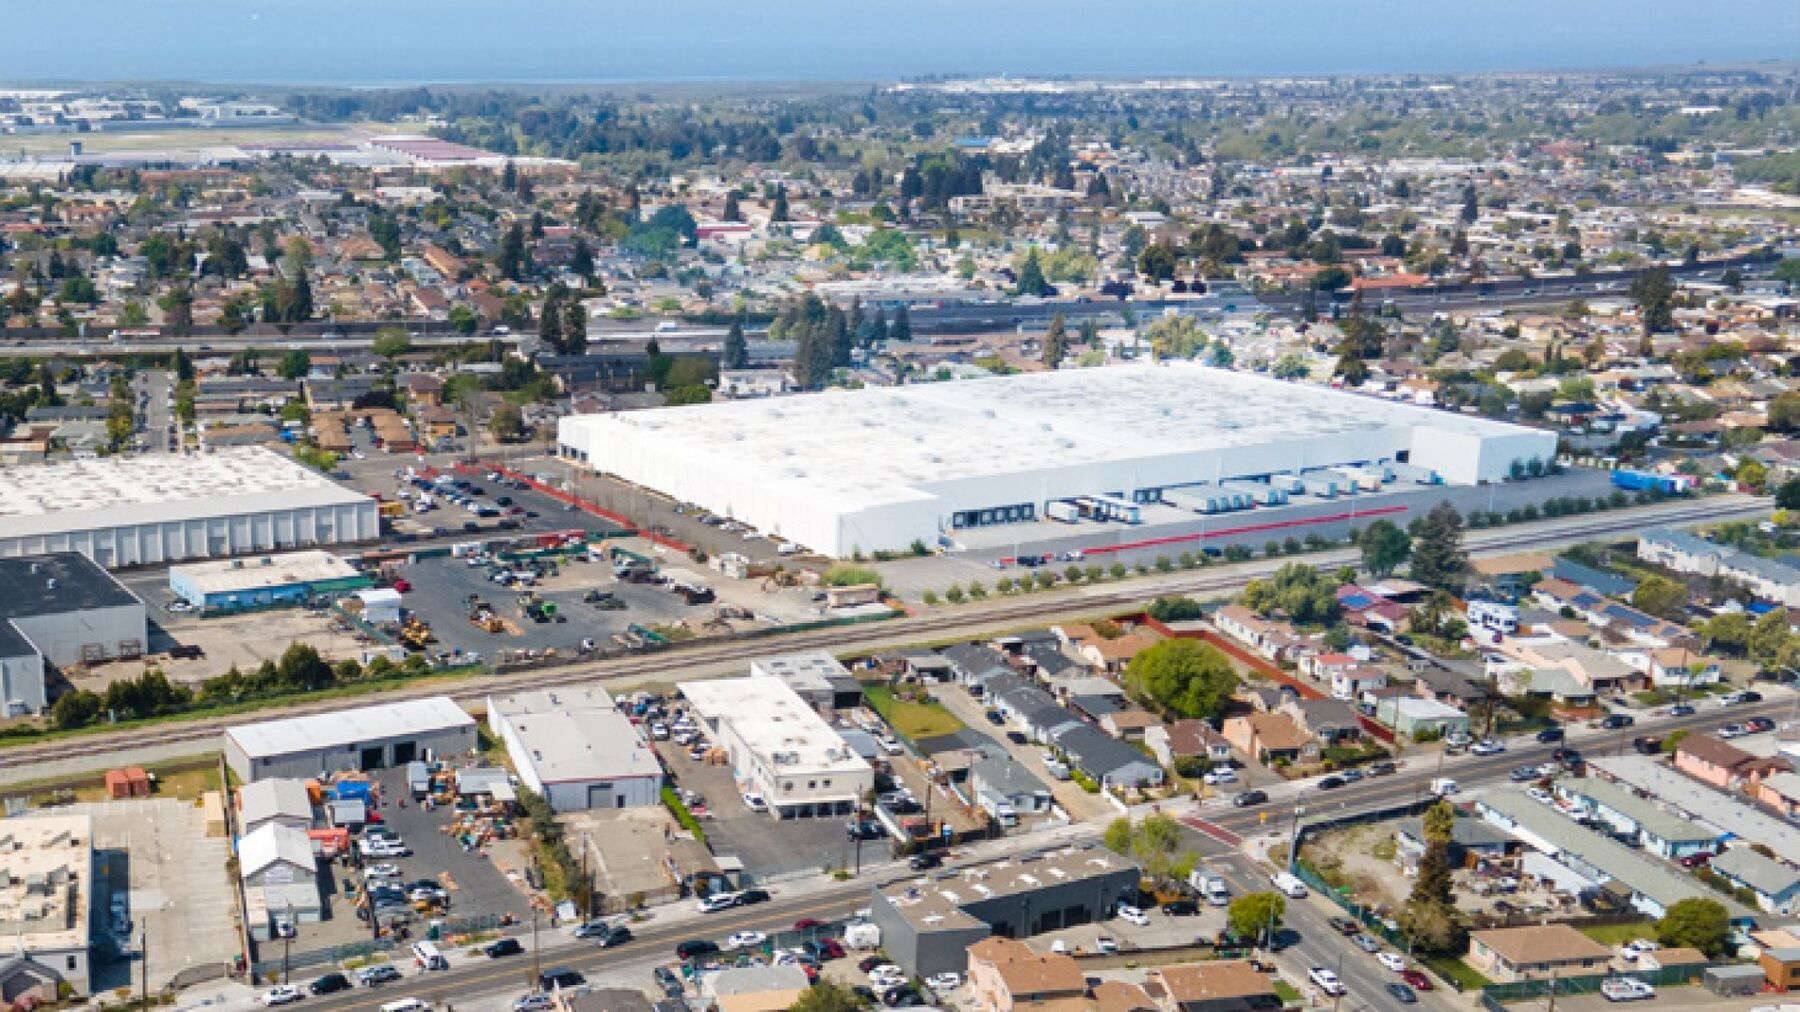 DPM-22290-Hathaway-Ave-Hayward-33-eba00133-Aerial-3.jpg